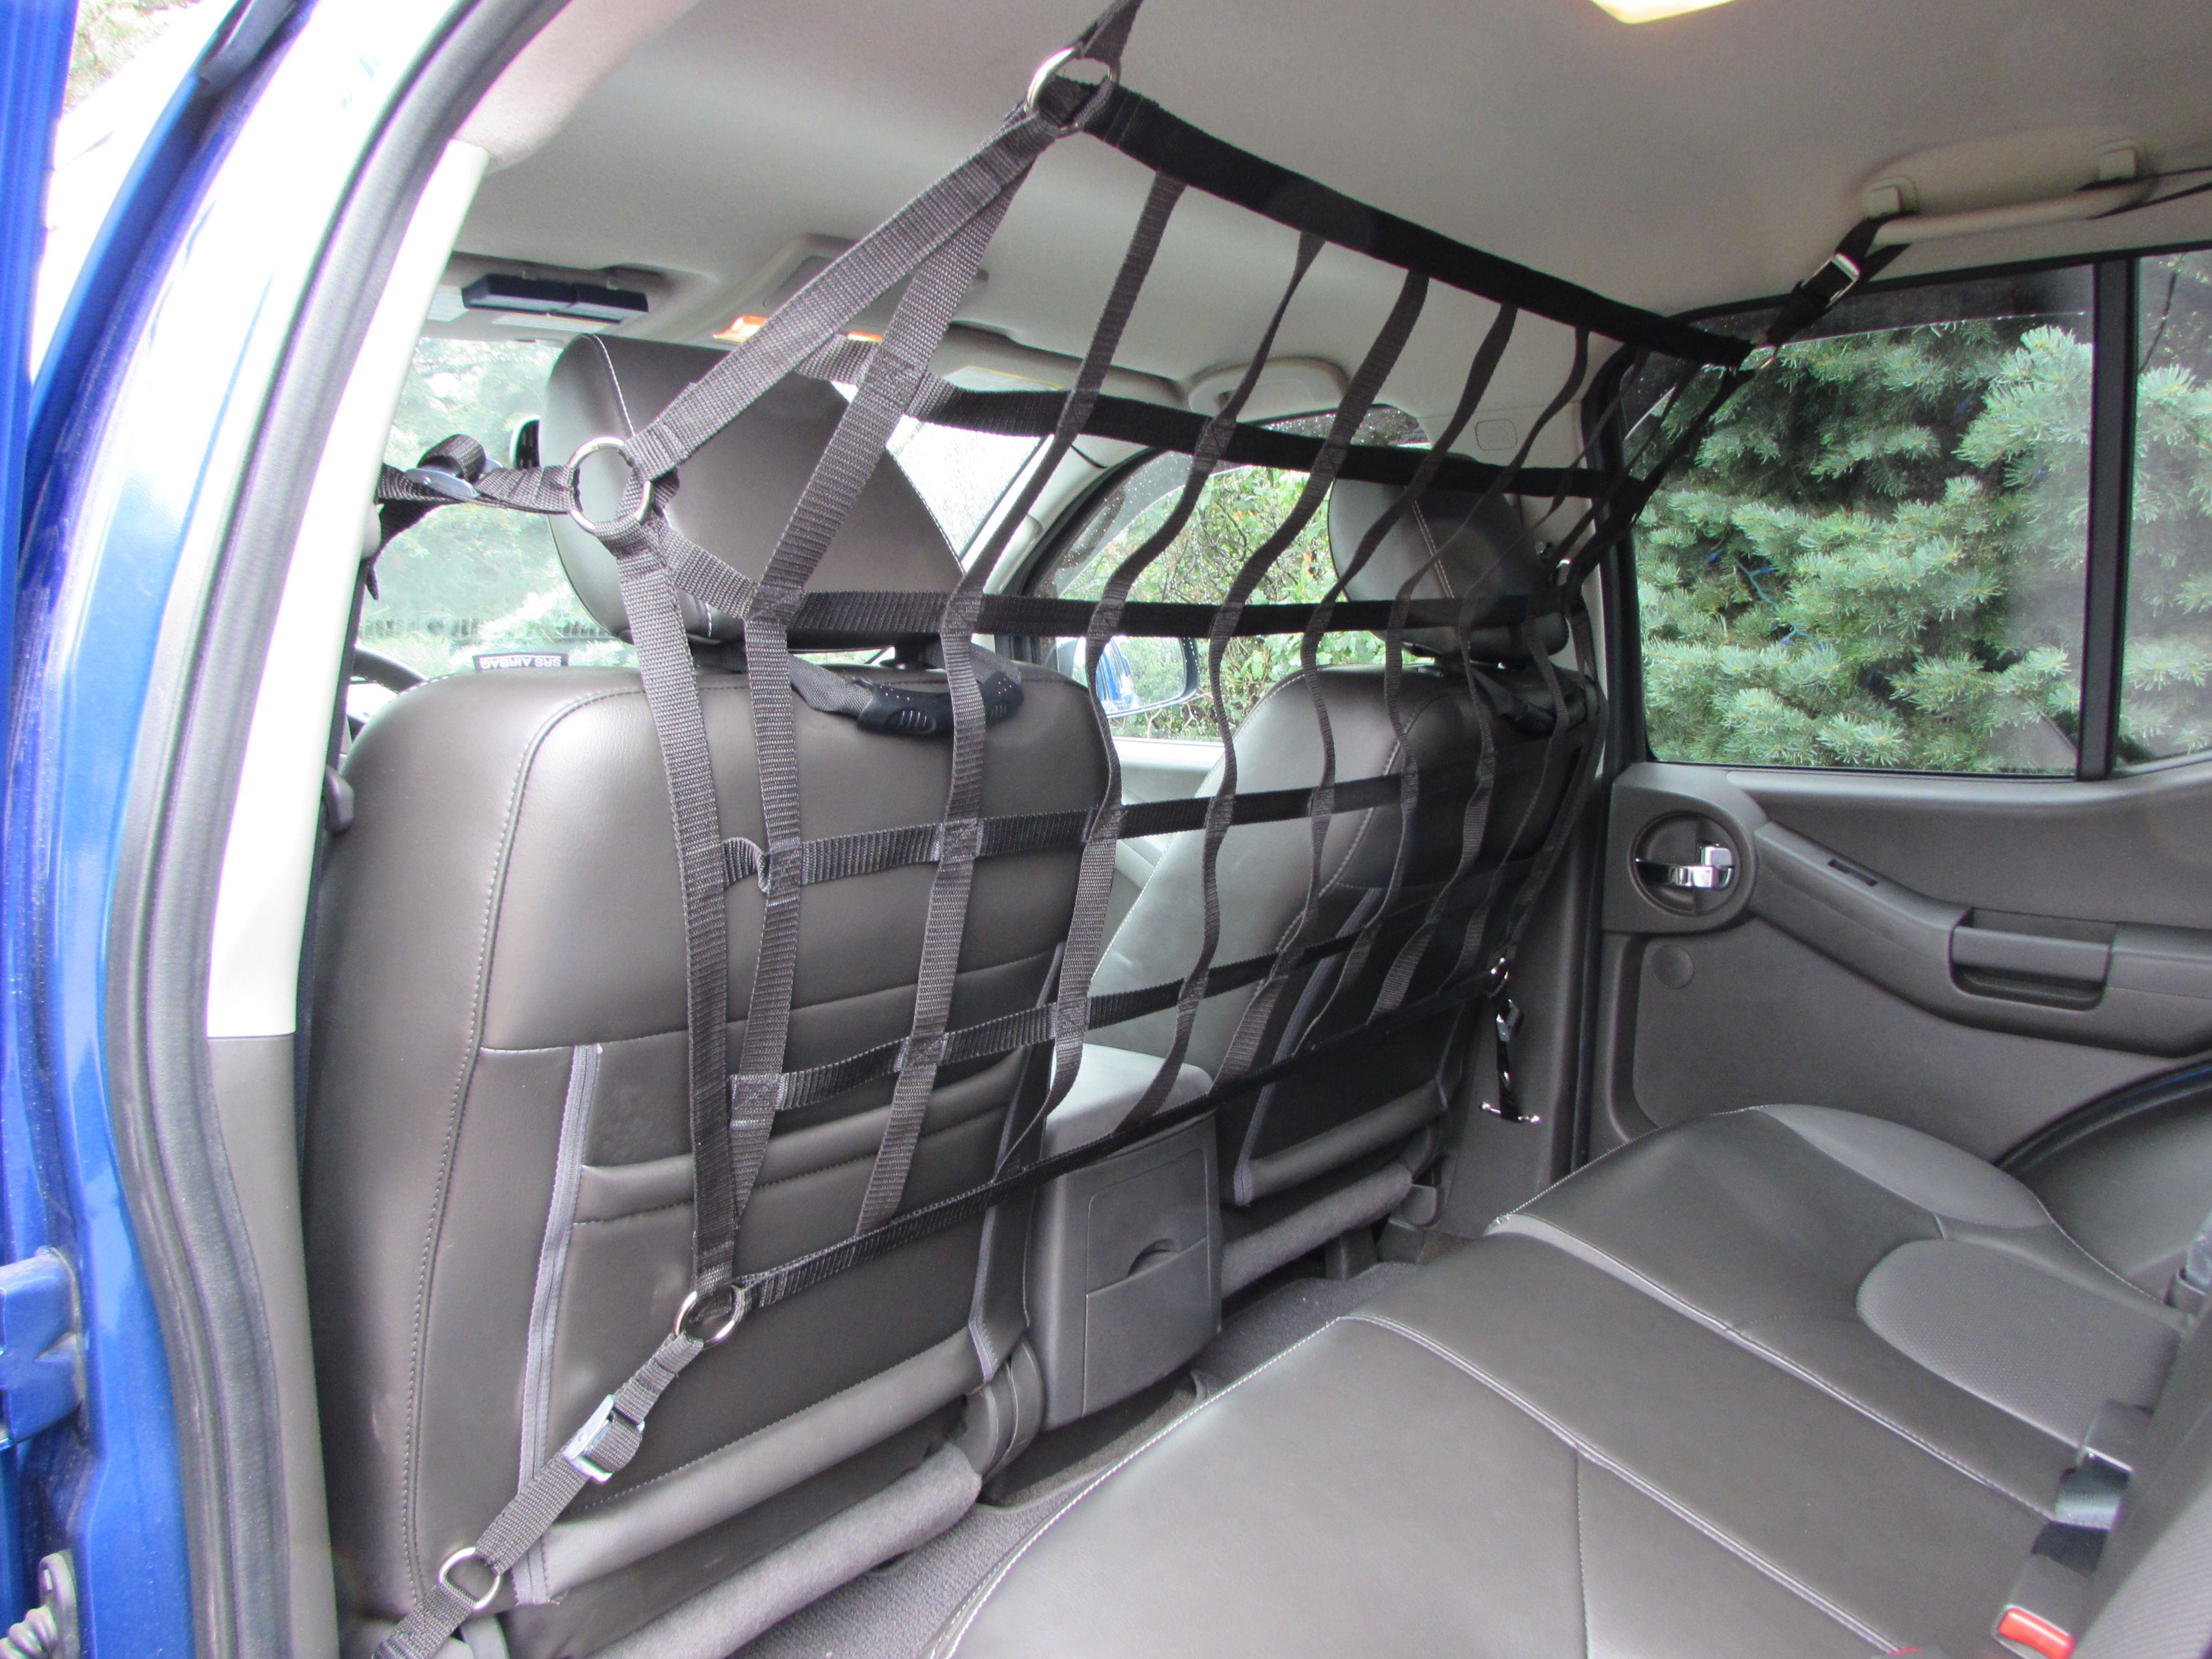 behind the front seat raingler barrier in nissan xterra. Black Bedroom Furniture Sets. Home Design Ideas